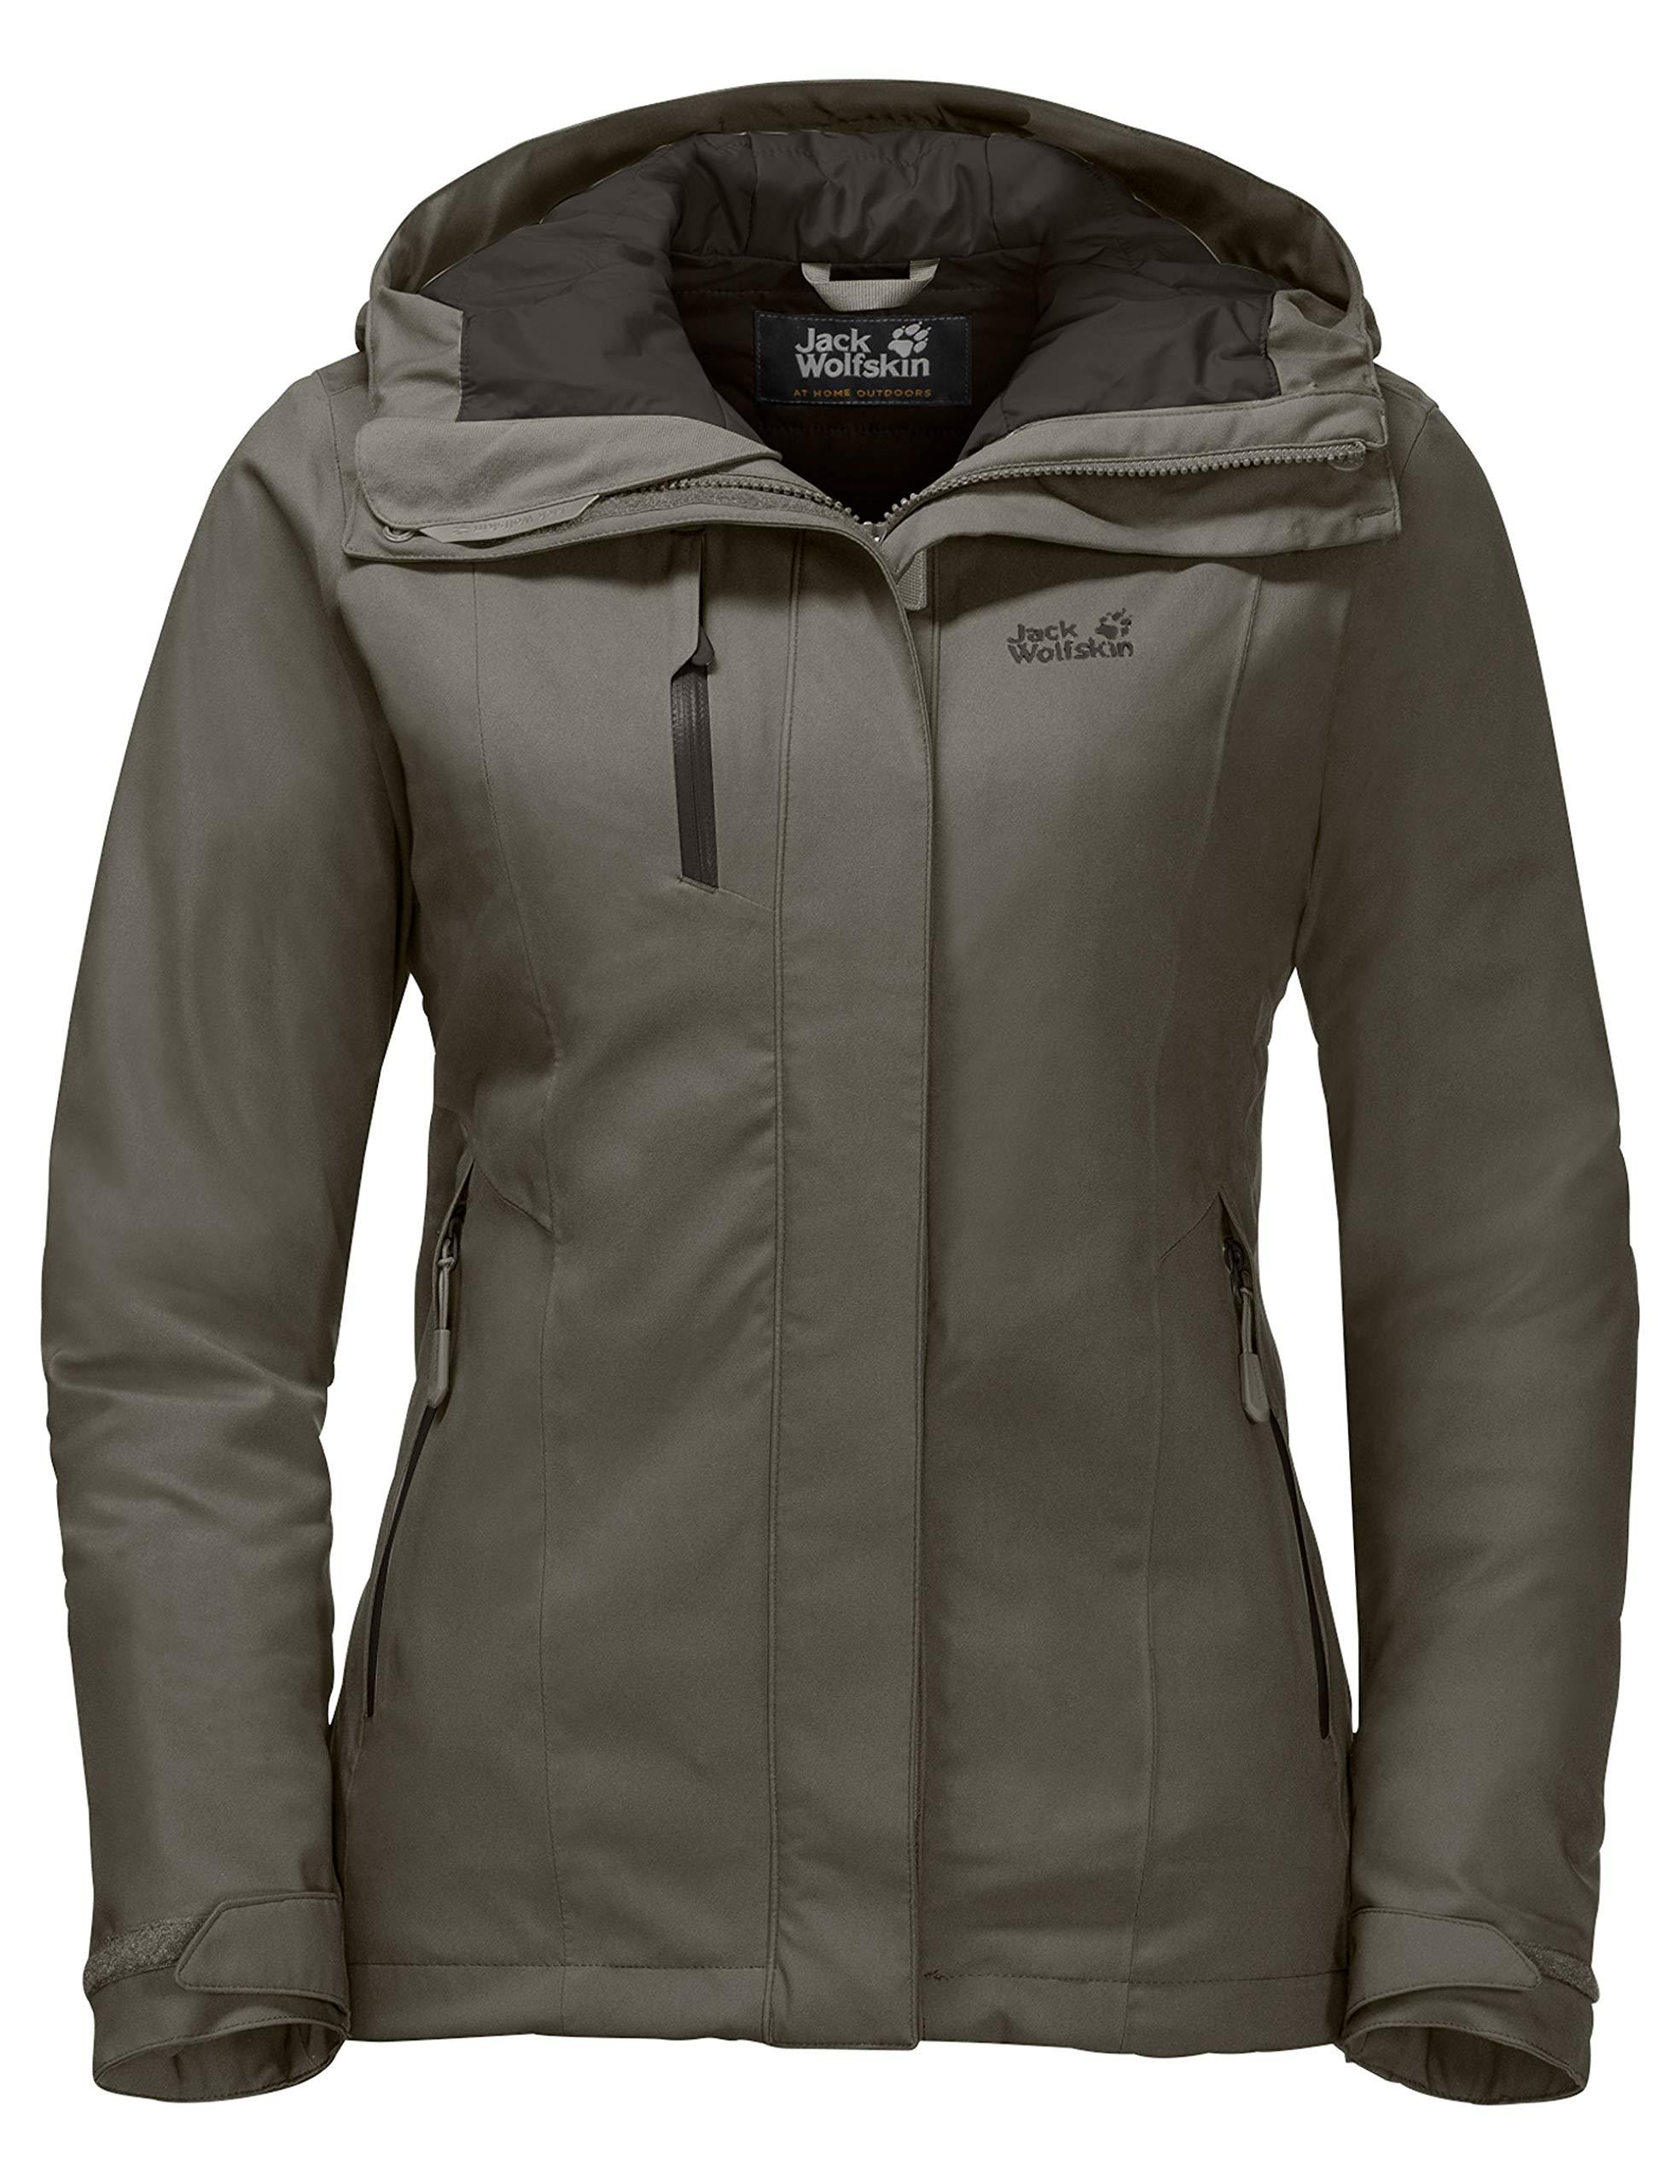 81b 9HcH3kL - Jack Wolfskin Women's Troposphere Winterwanderjacke Wasserdicht Winddicht Atmungsaktiv Weather Protection Jacket